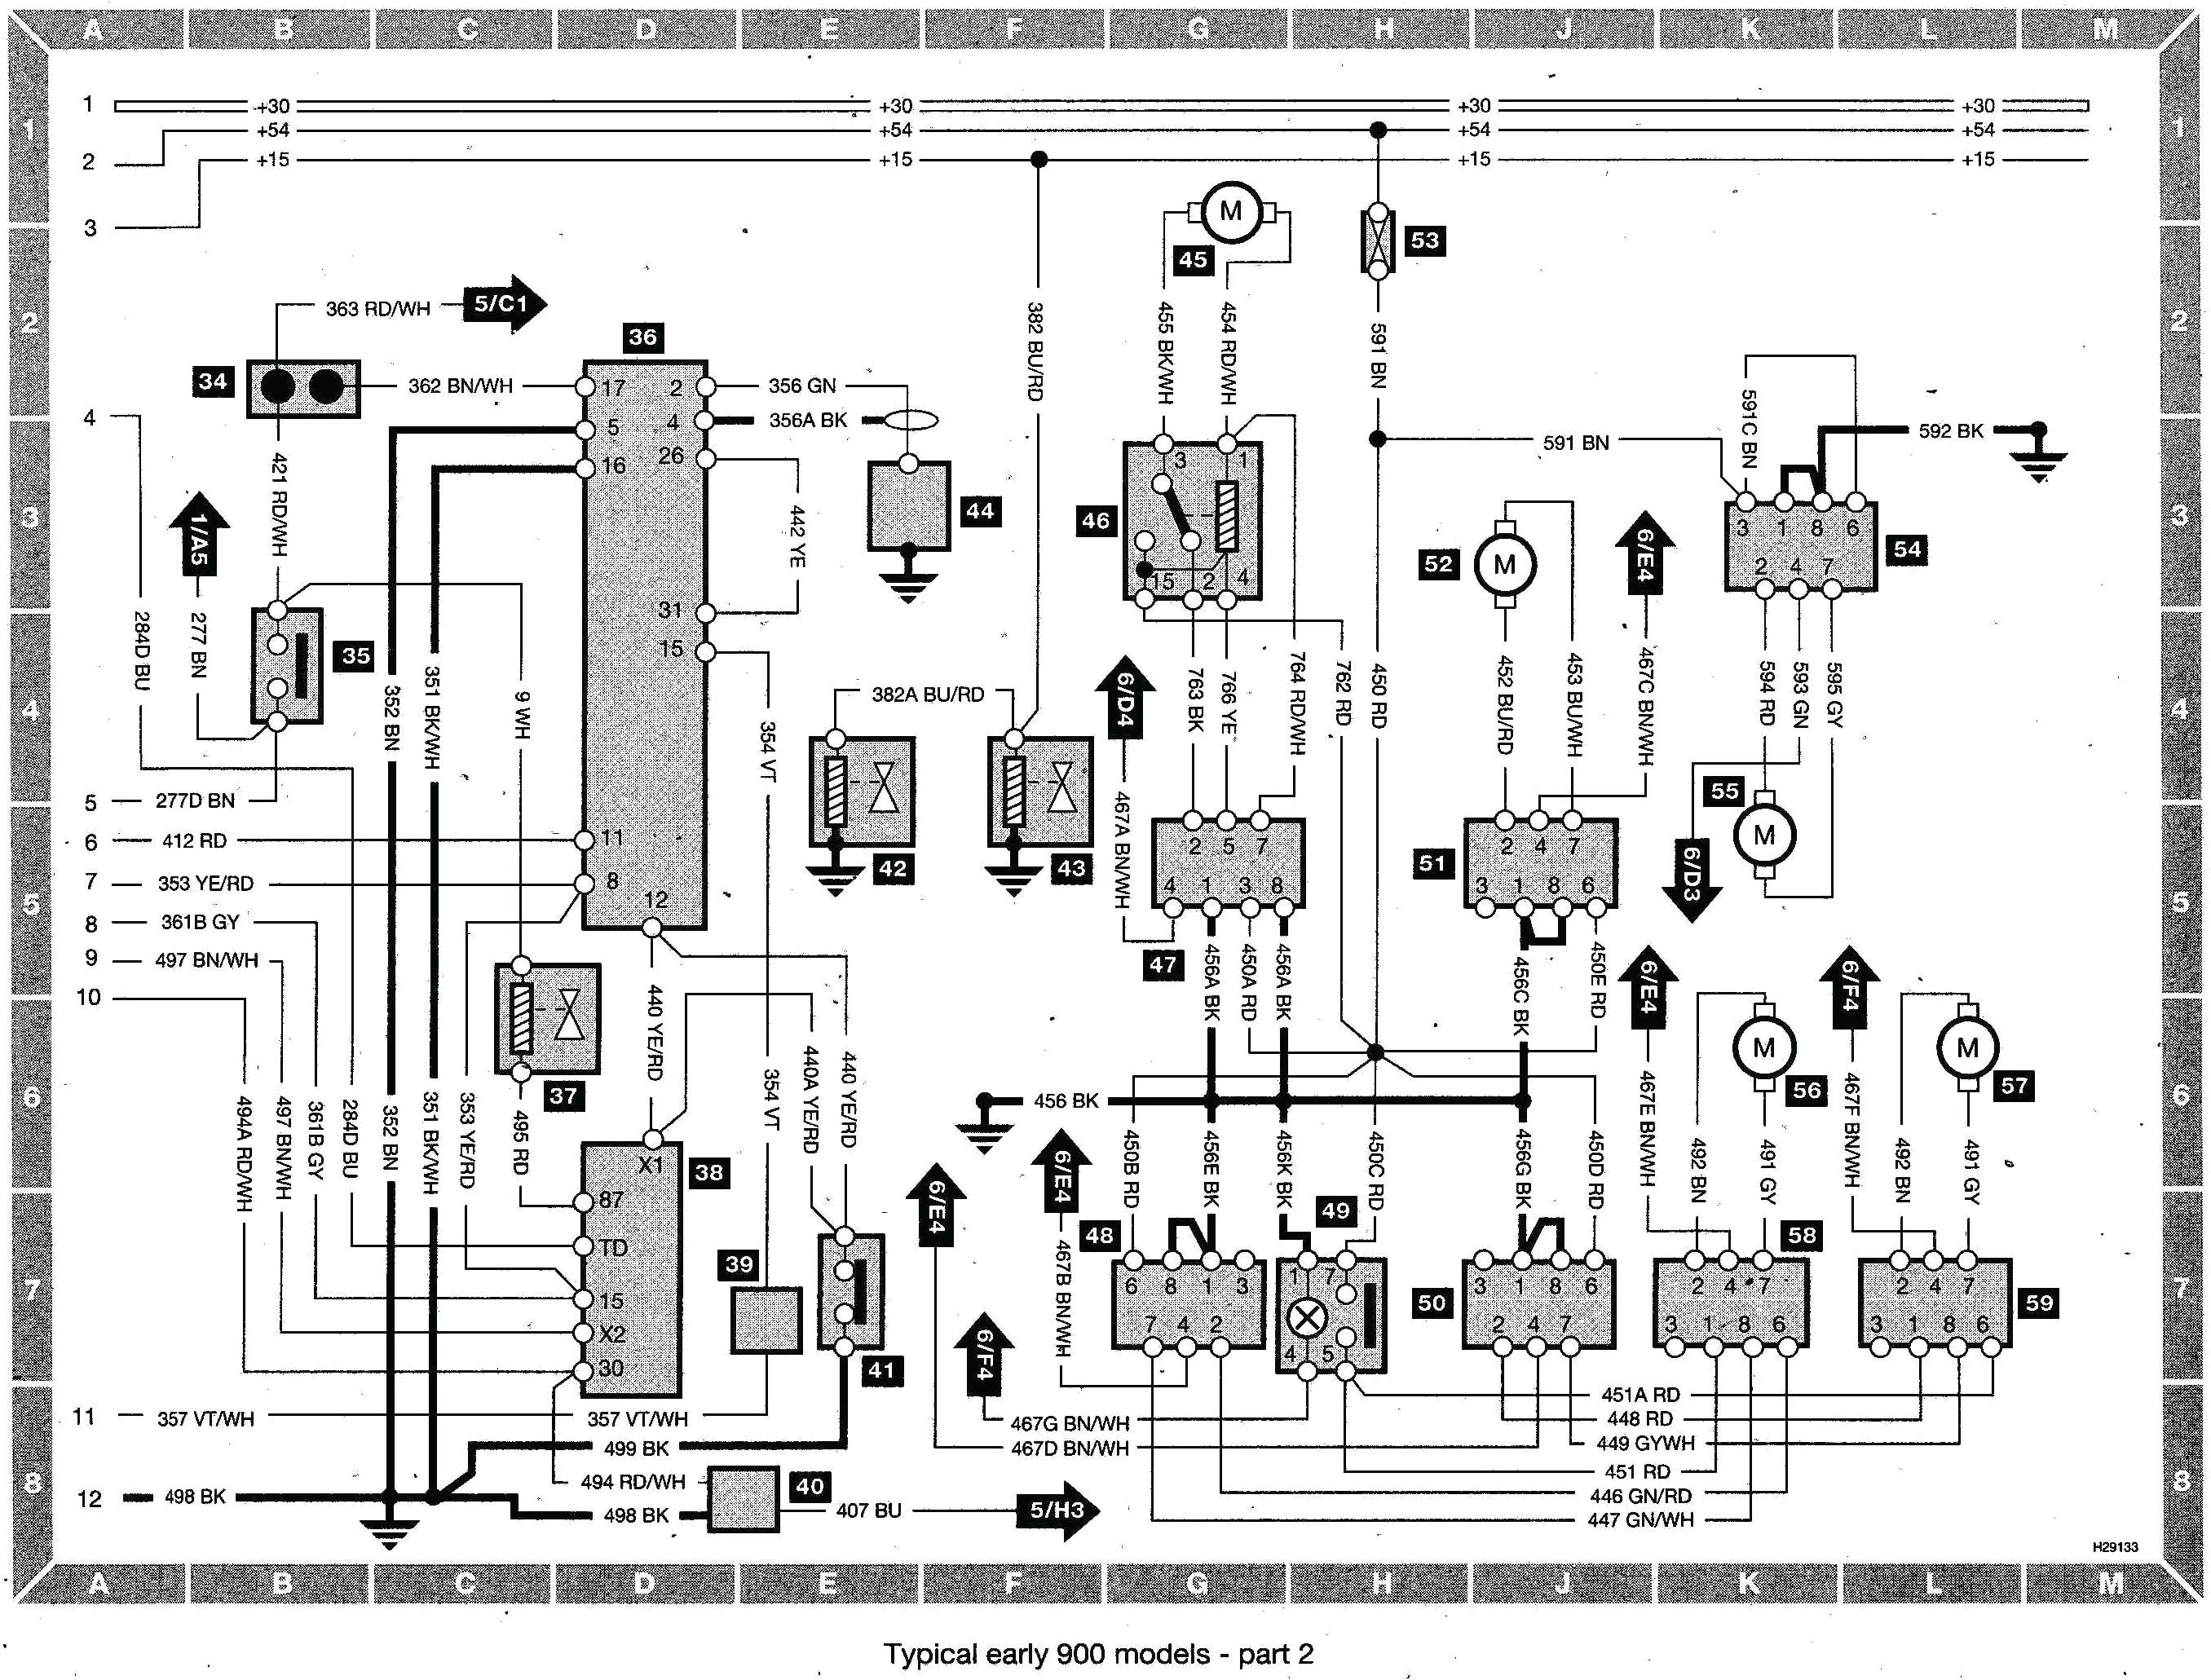 1989 saab wiring harness wiring diagram page saab 900 wiring harness